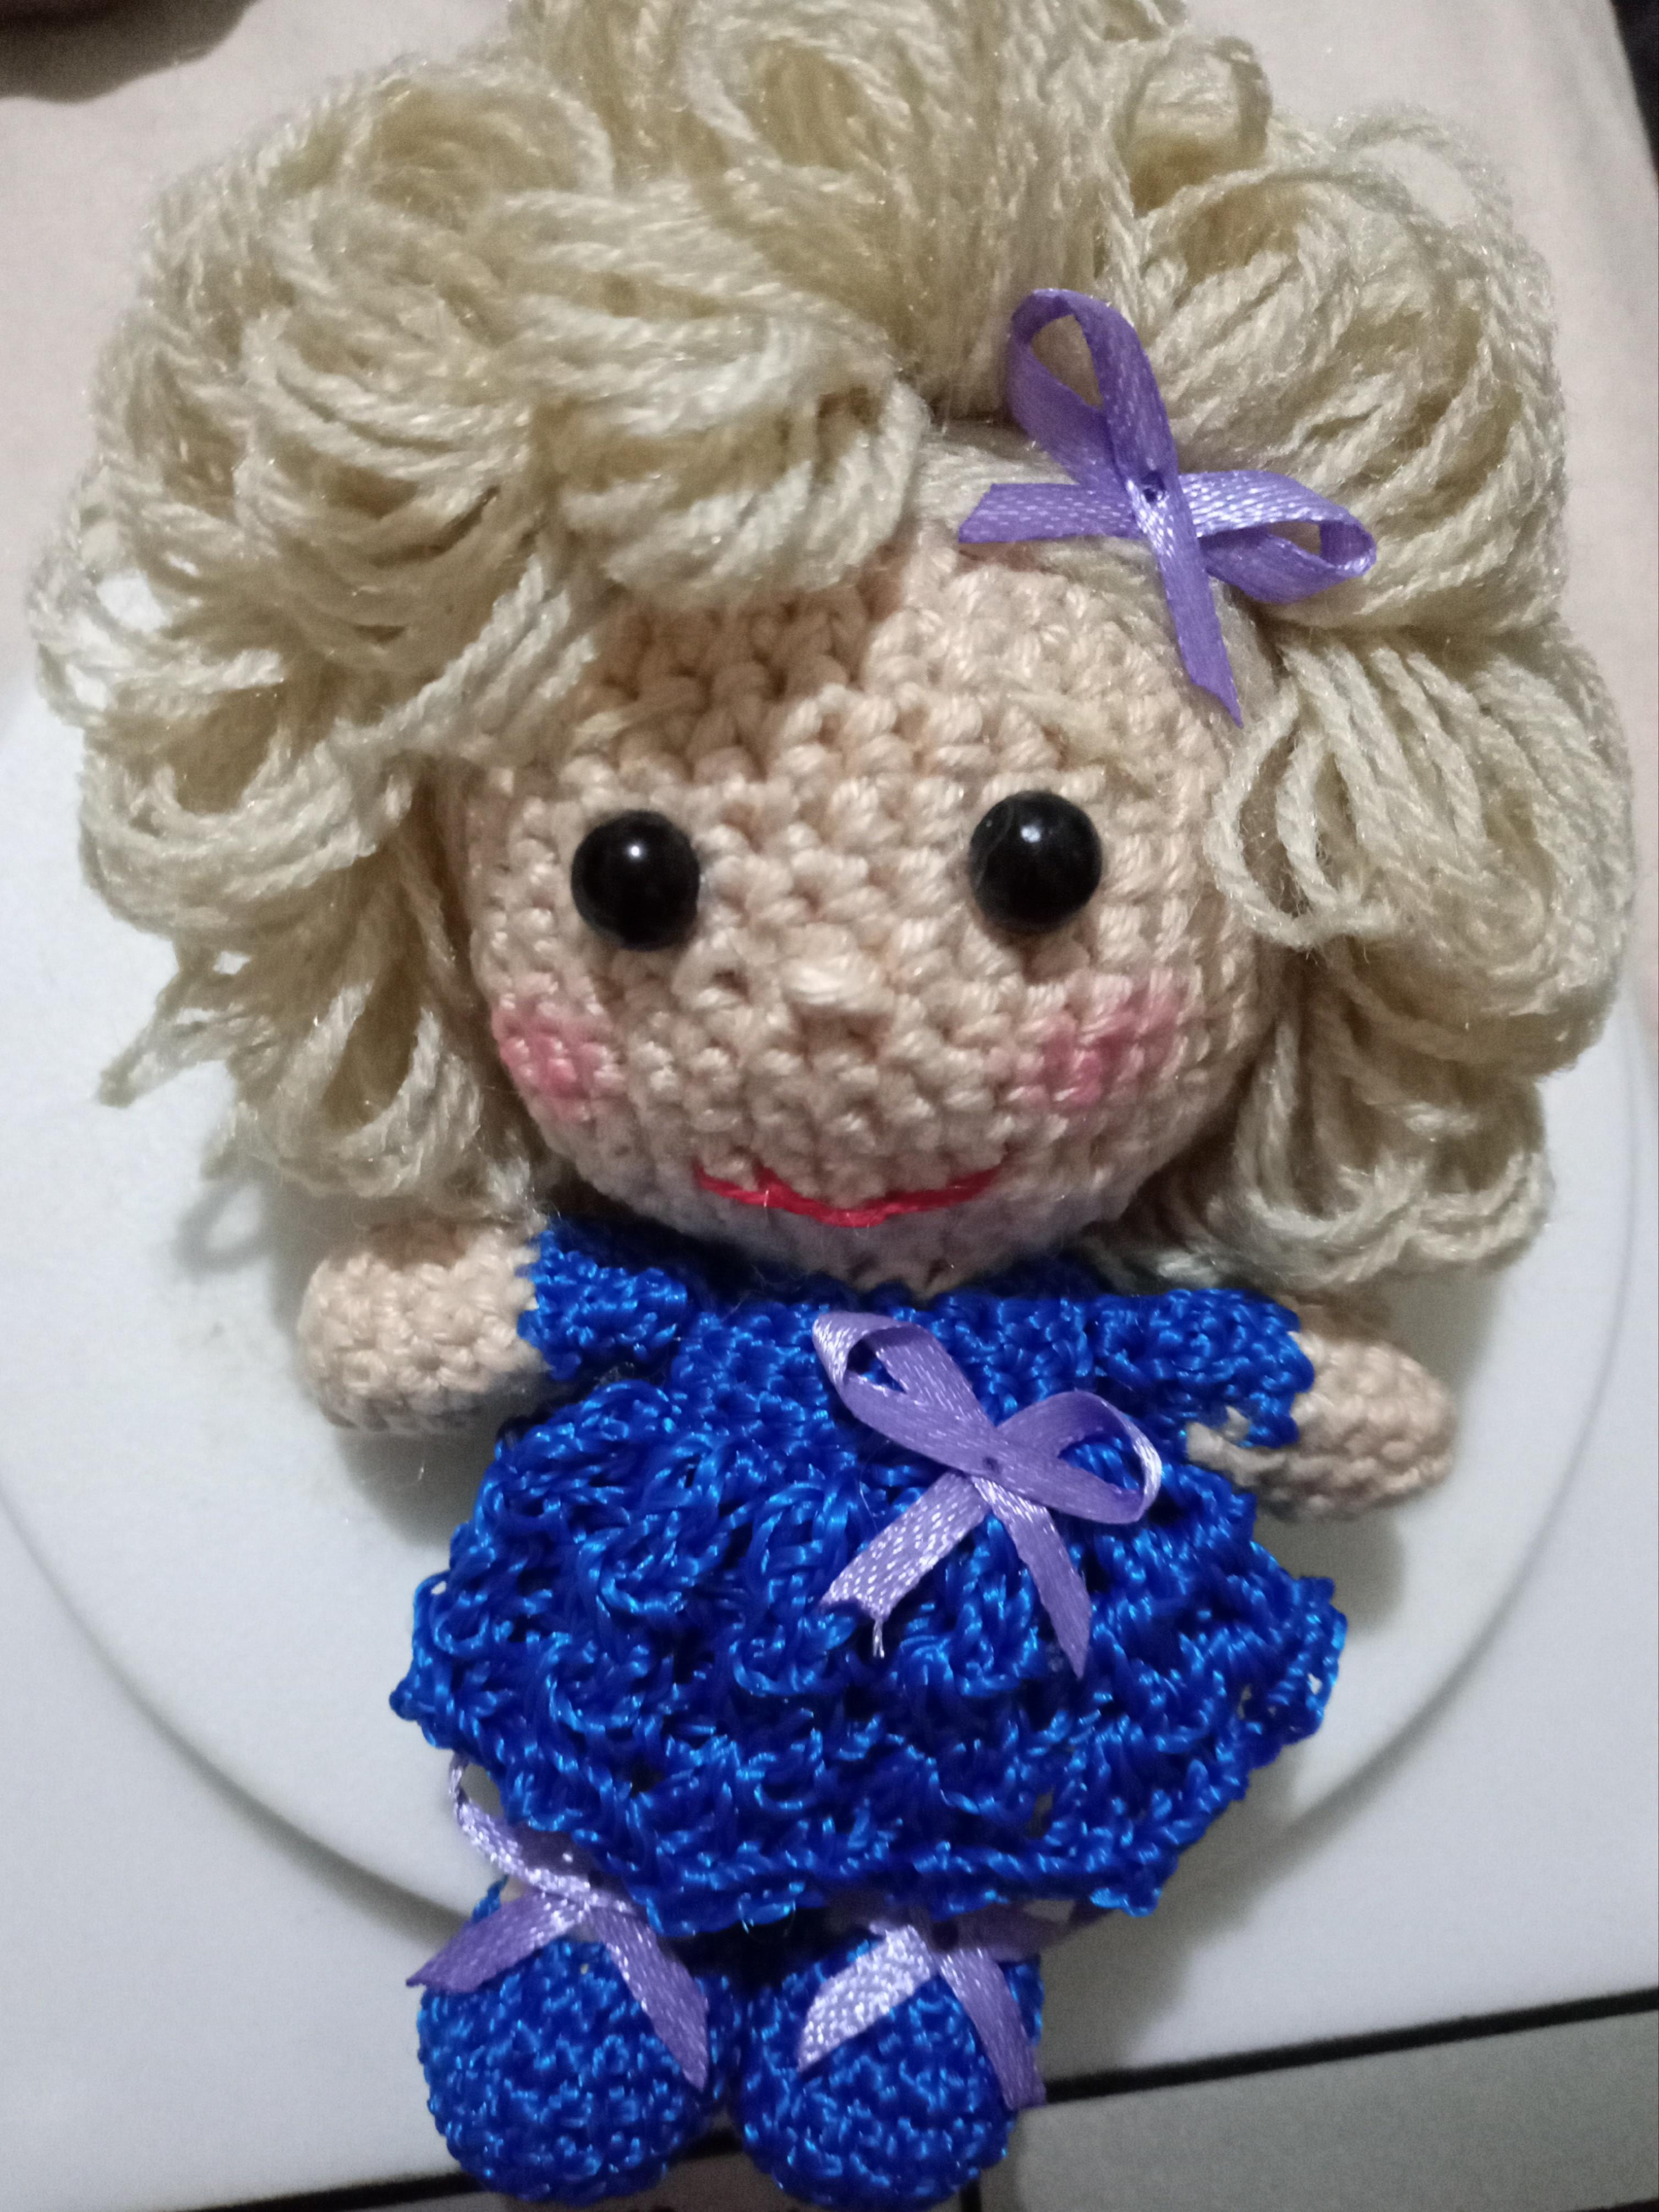 Amigurumi Boneca pra filha Chaveiro... - Ledde Croche e Cia | Facebook | 4020x3015